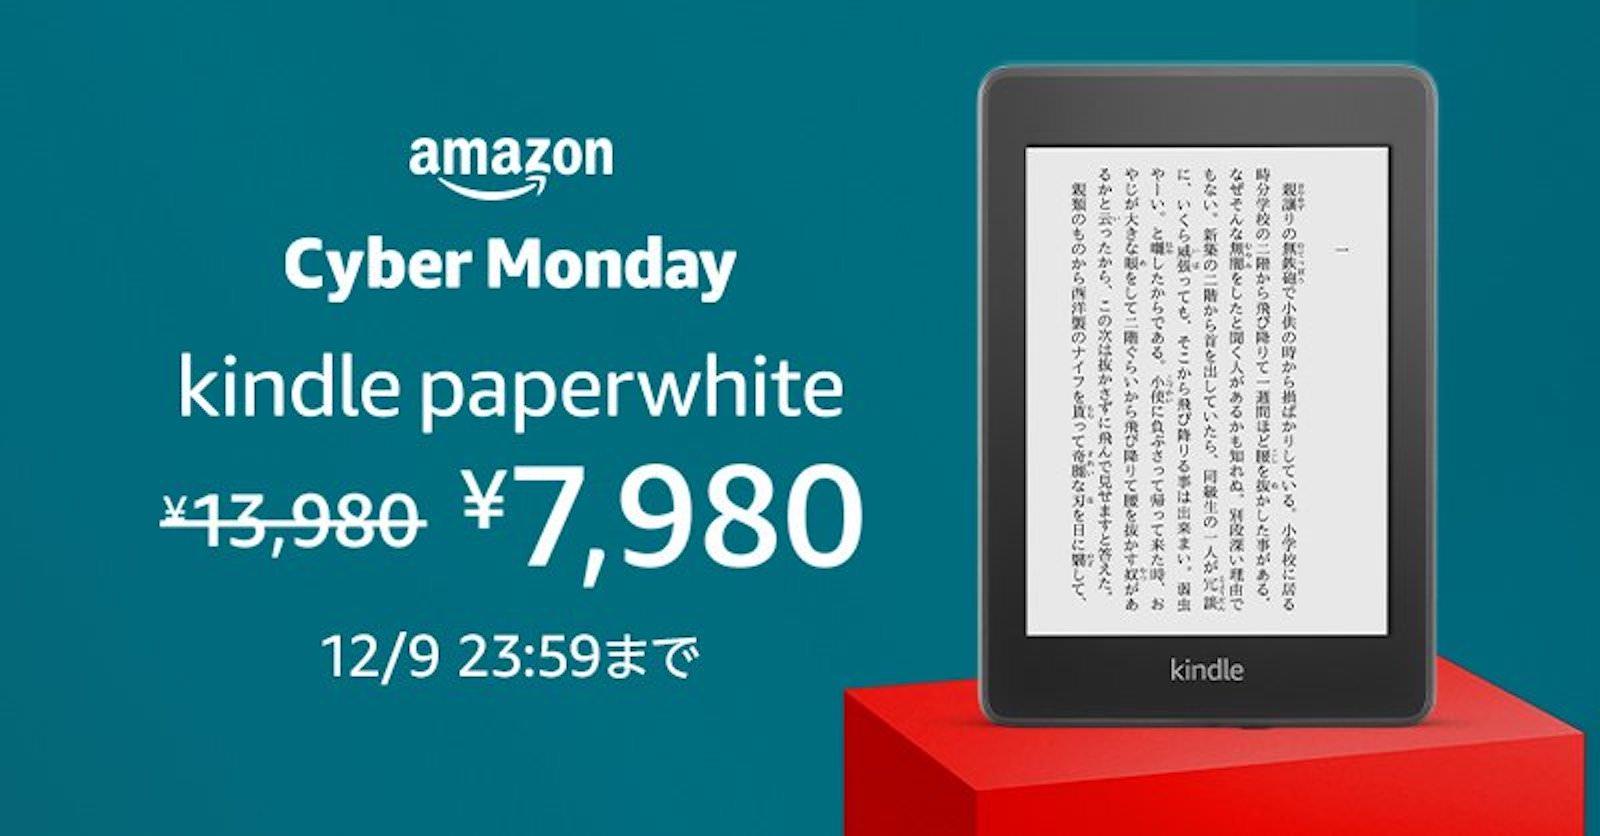 Kindle Paperwhite on sale